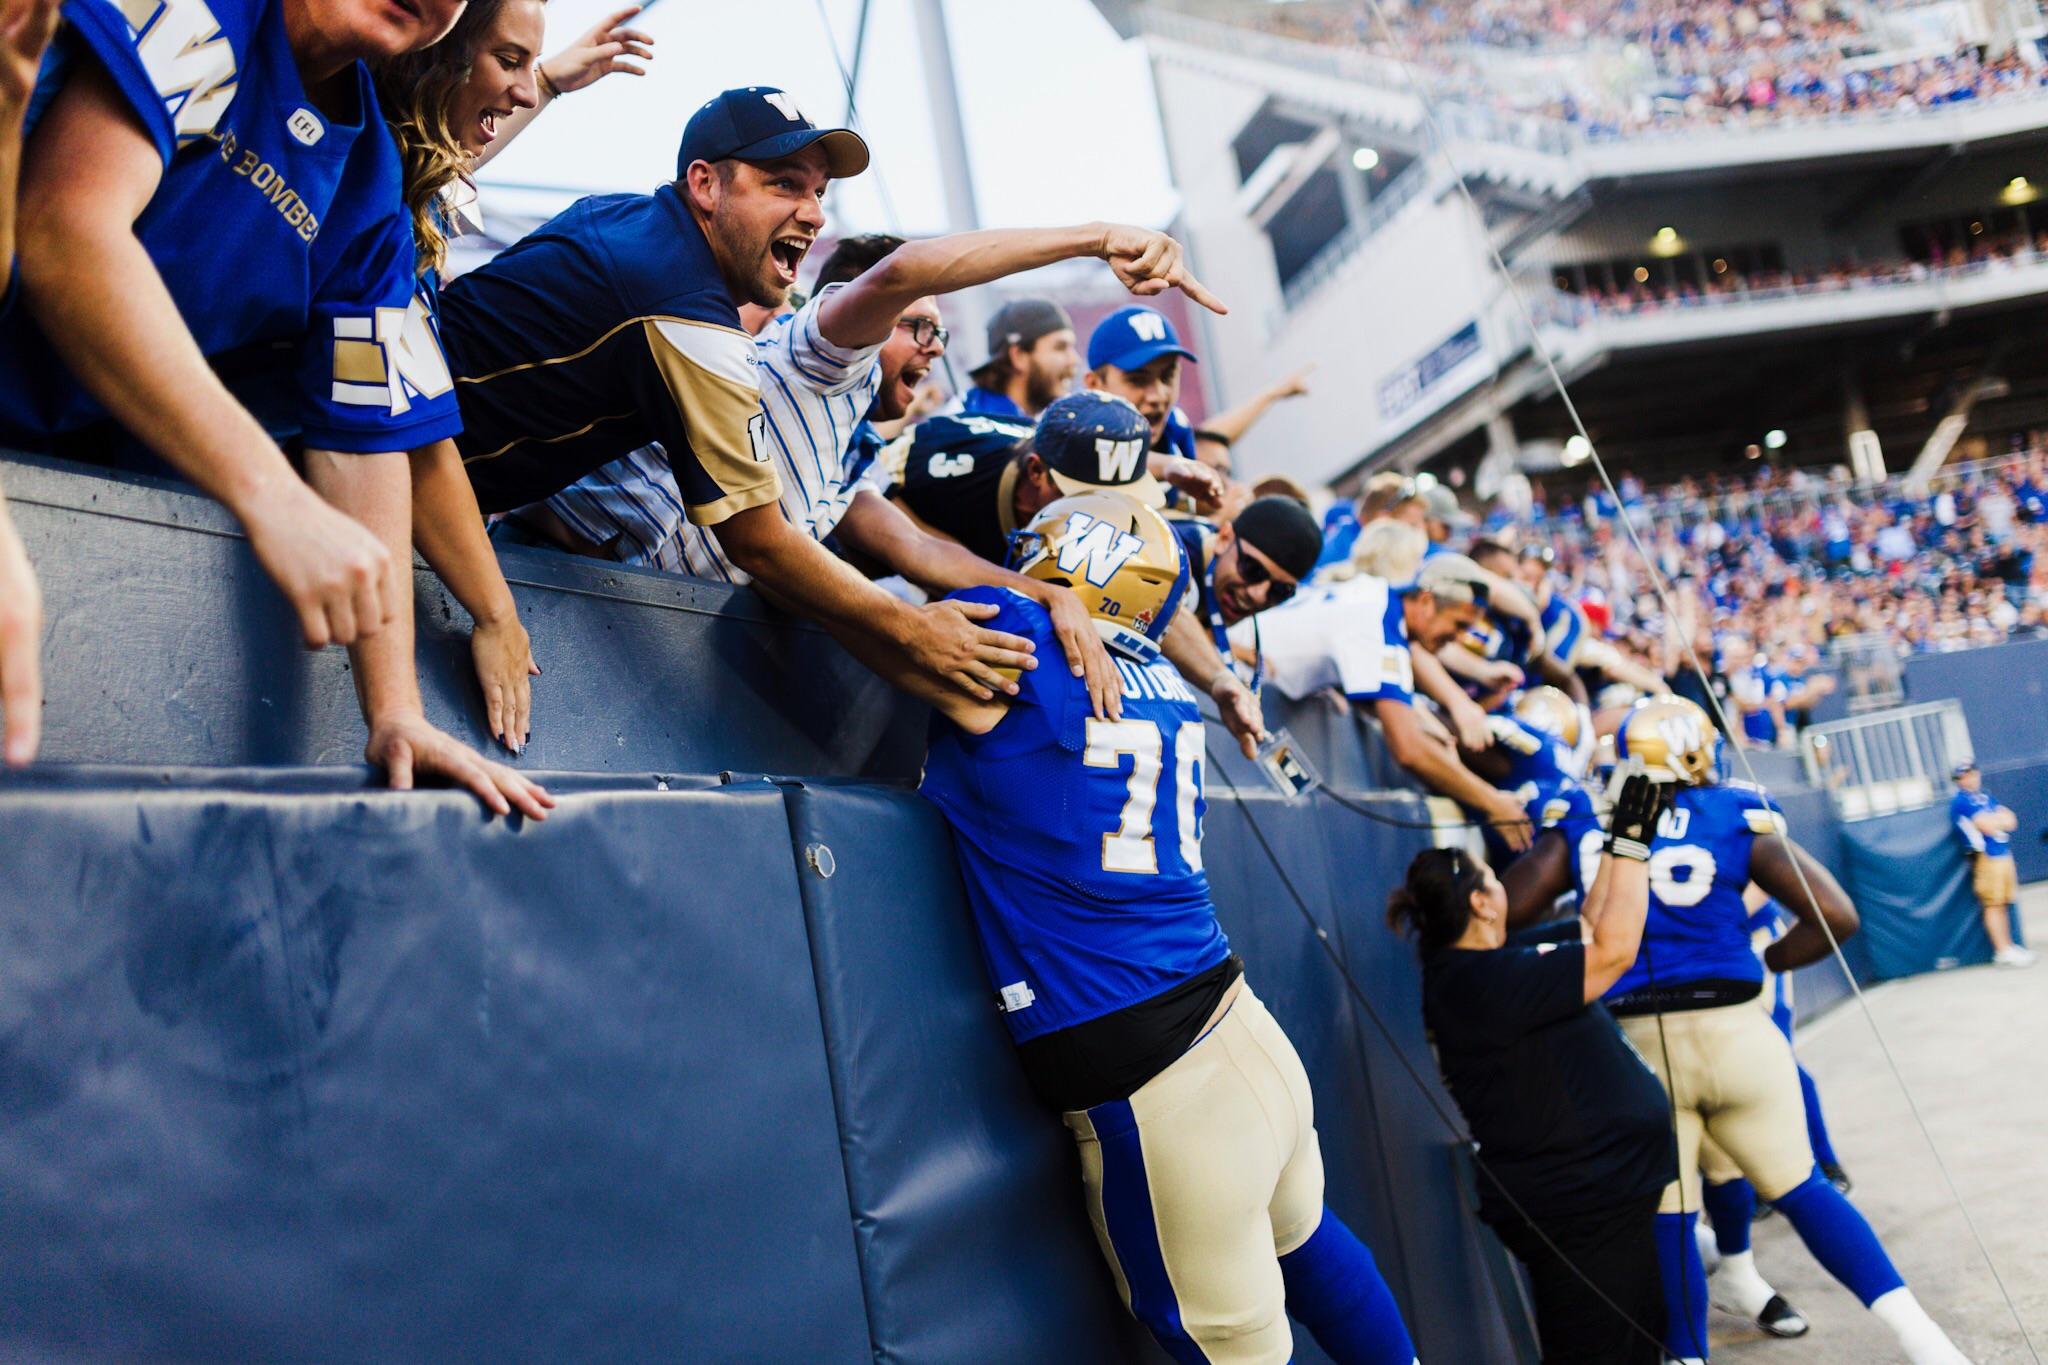 Winnipeg Blue Bombers jump into the crowd